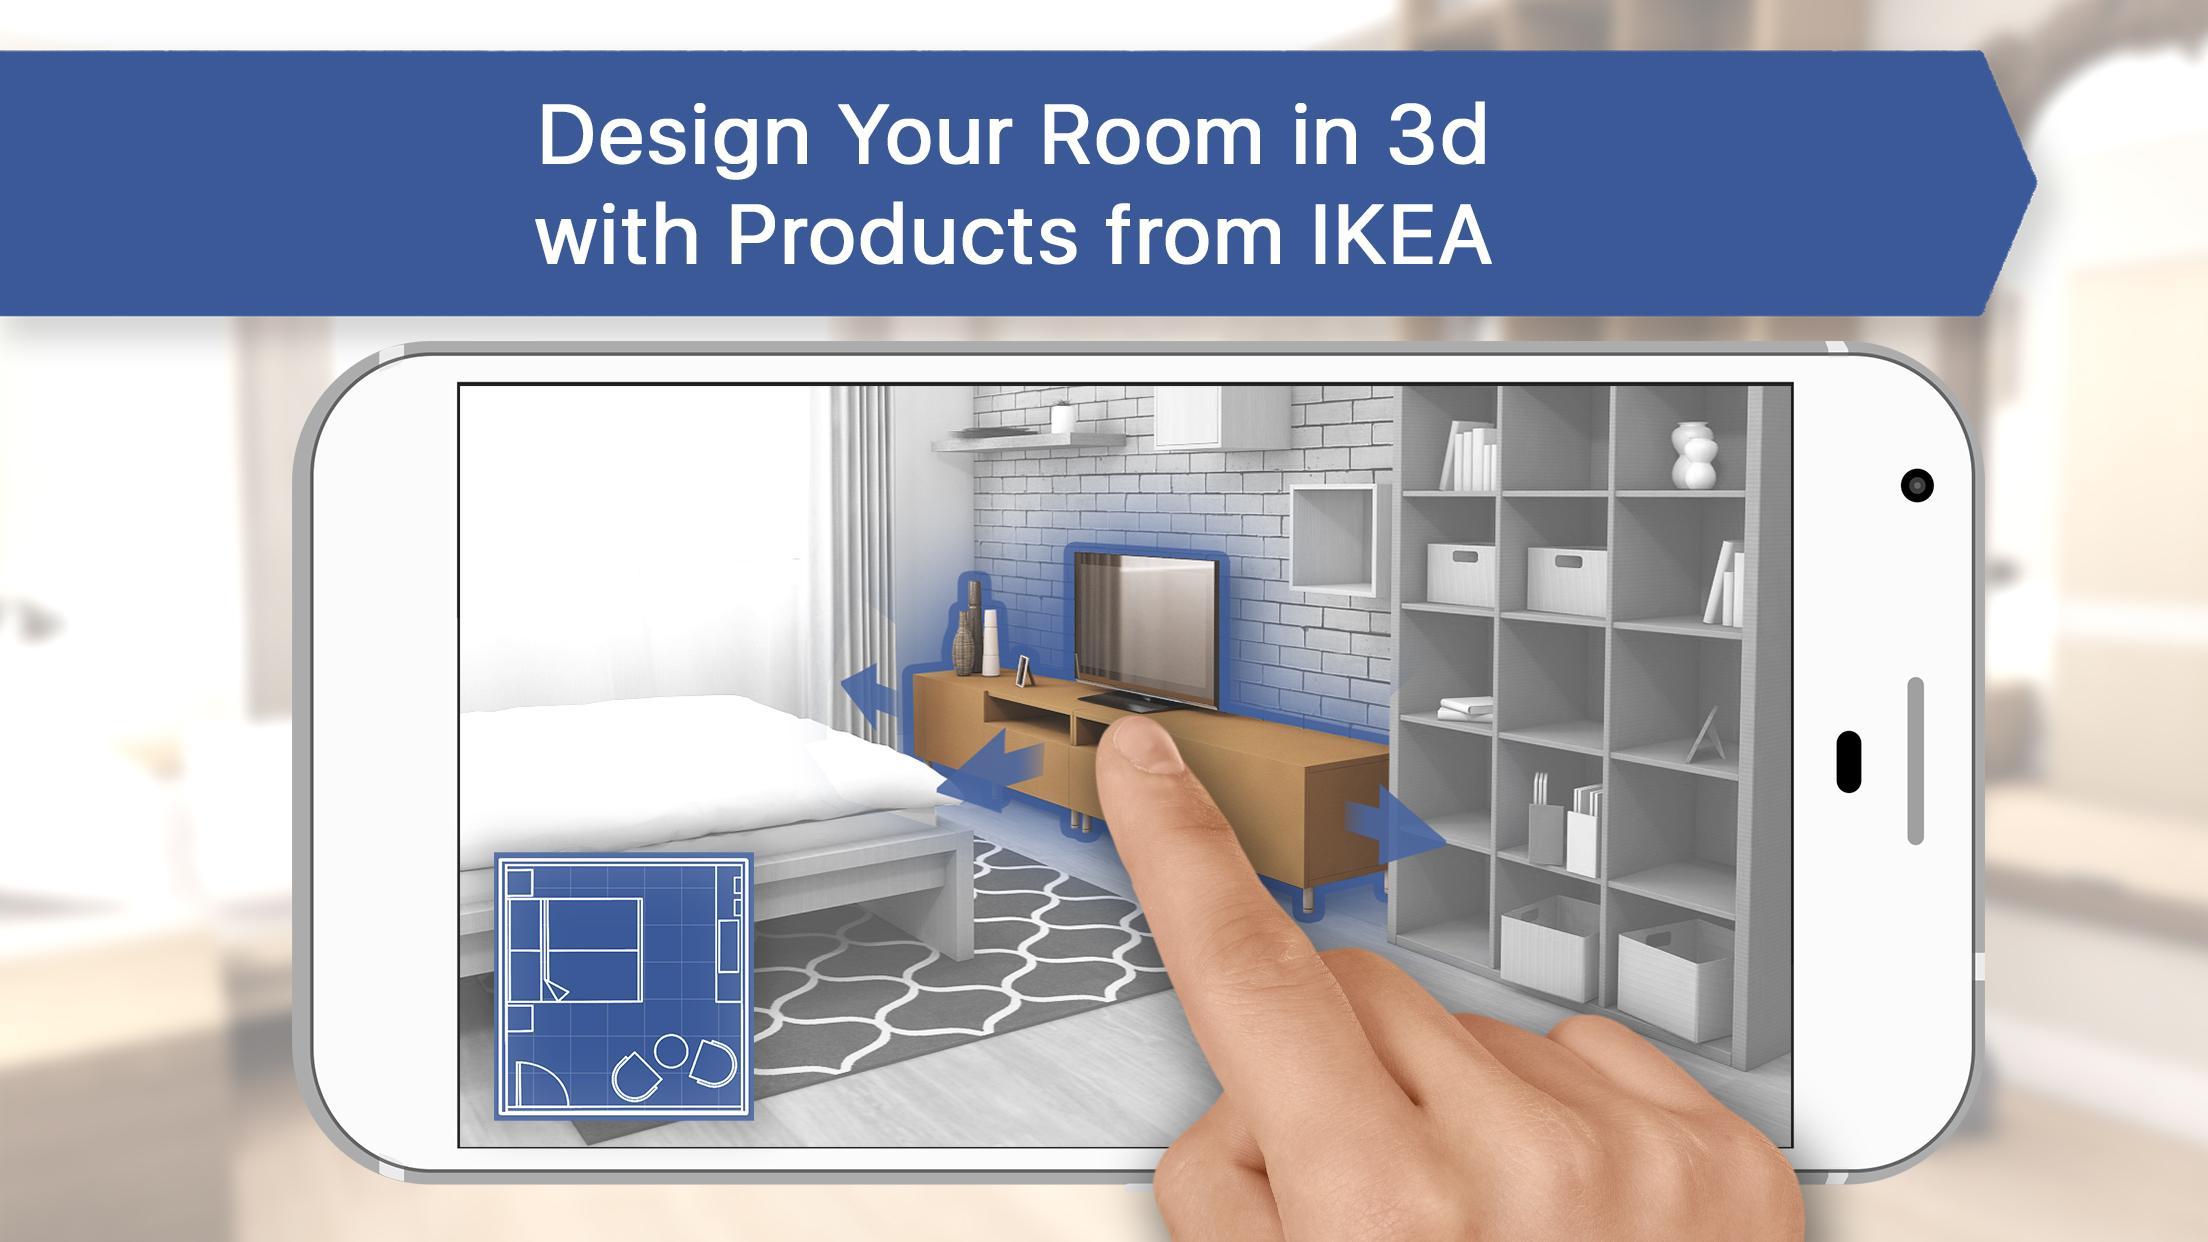 Room Planner Home Interior Floorplan Design 3d Apk 996 Download For Android Download Room Planner Home Interior Floorplan Design 3d Xapk Apk Obb Data Latest Version Apkfab Com